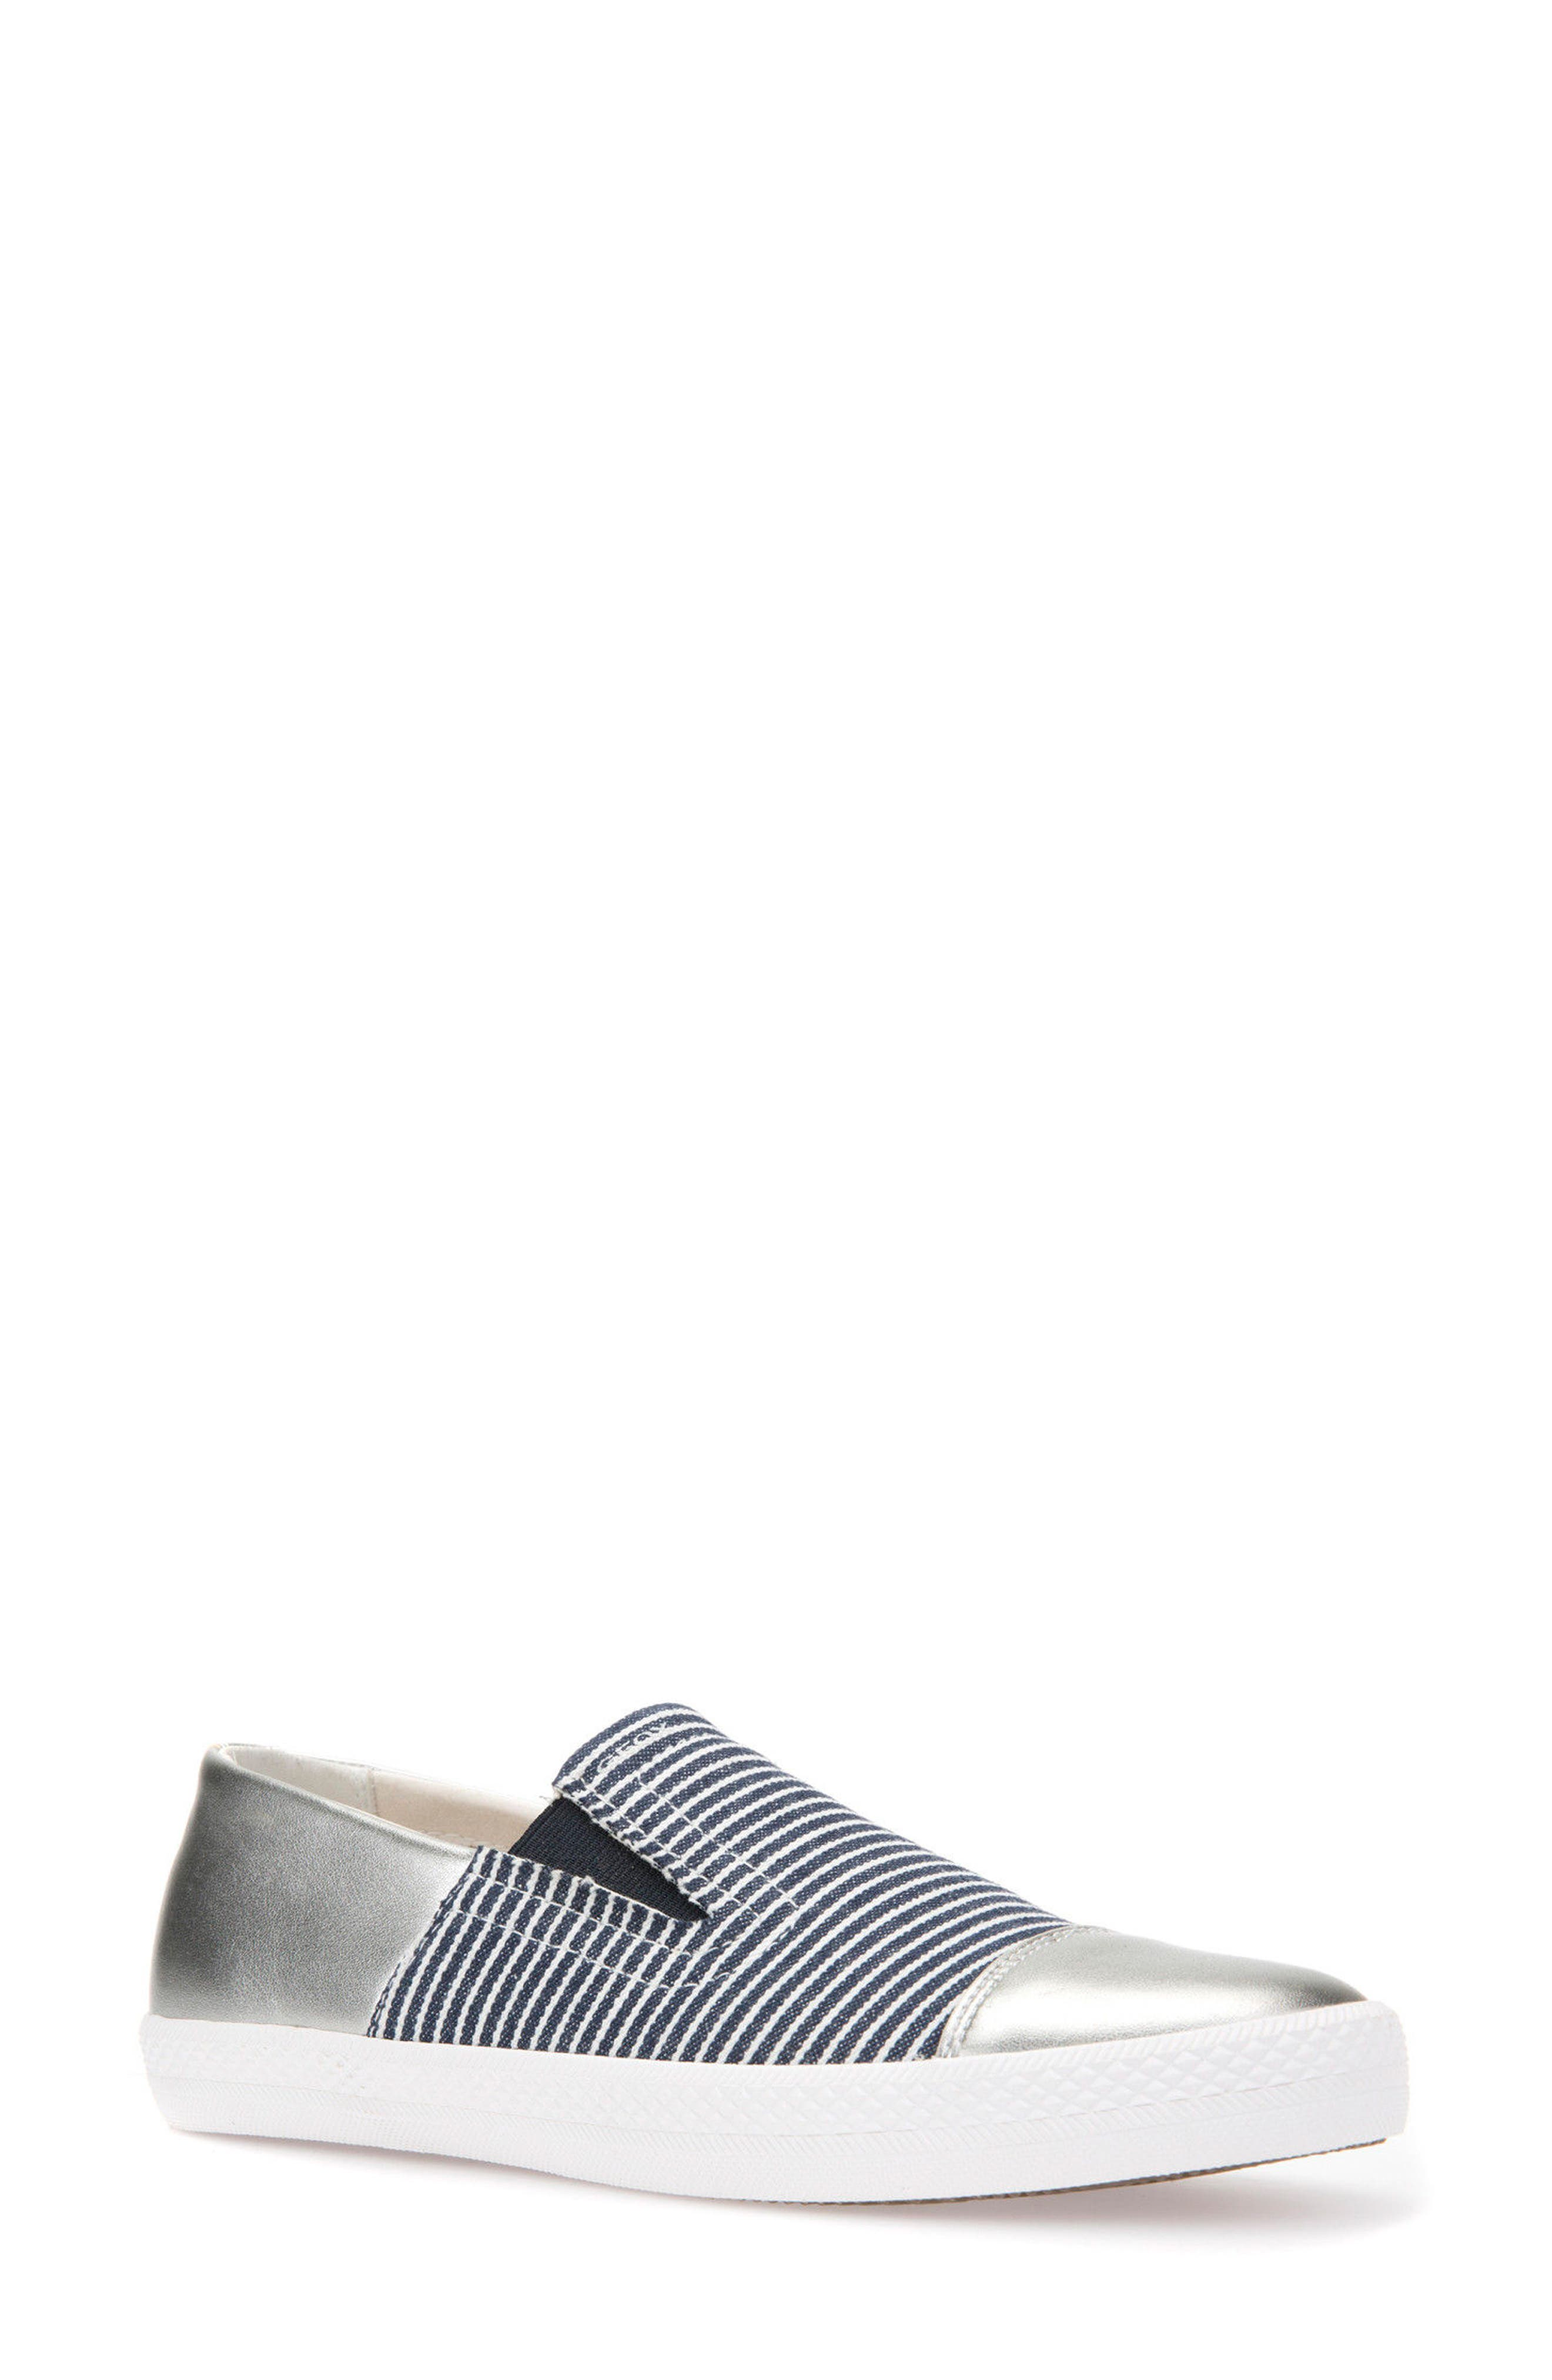 Geox Giyo Slip-On Sneaker (Women)